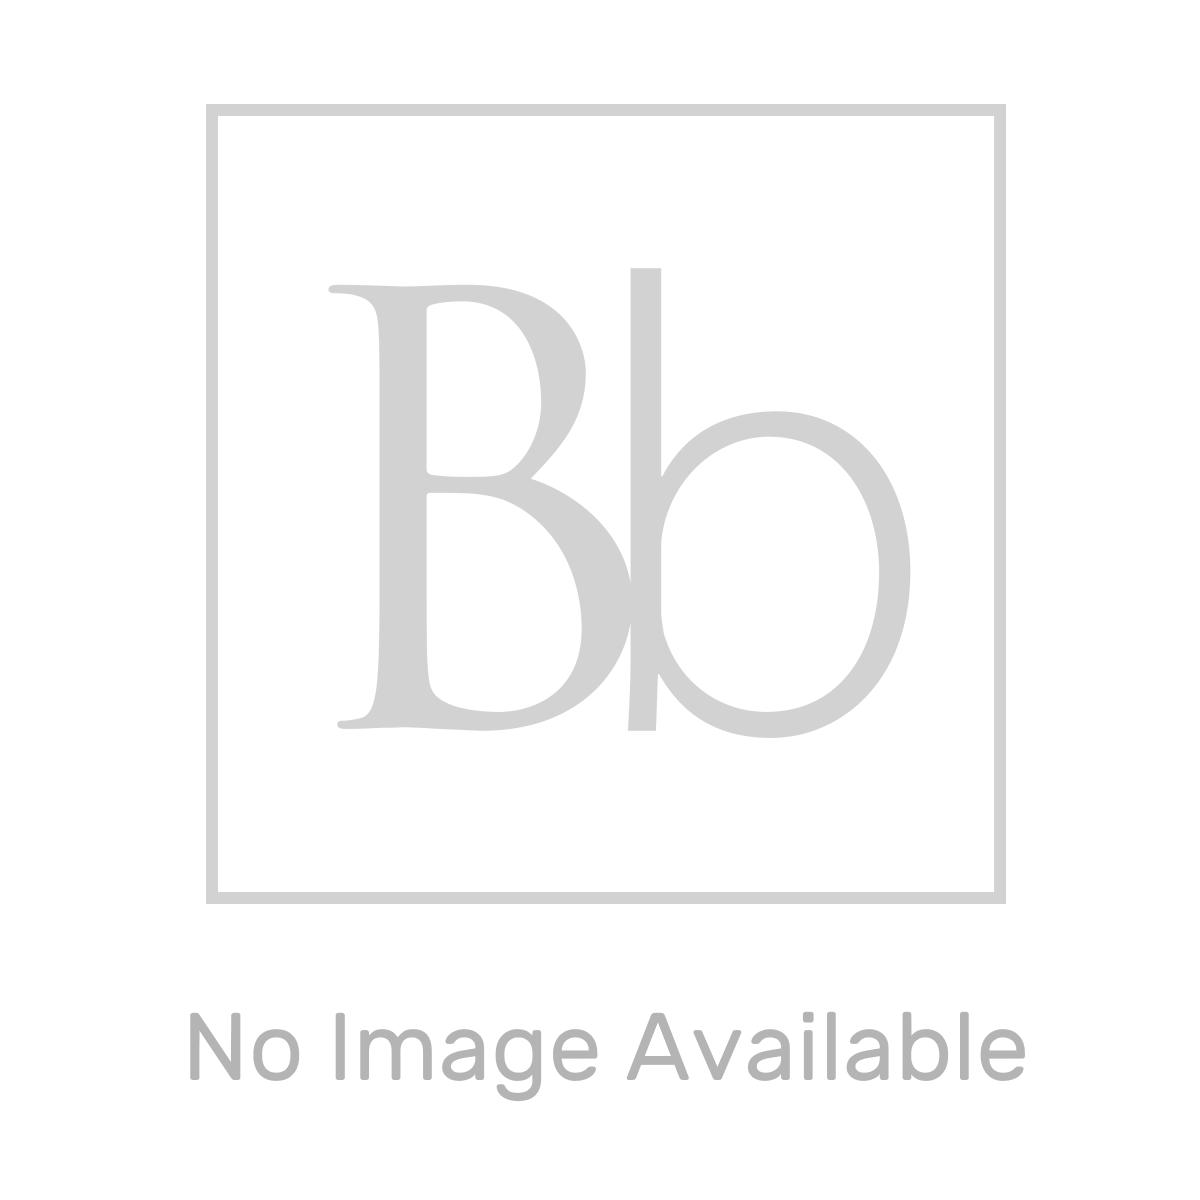 Aquadart Black Slate Shower Tray 1700 x 760